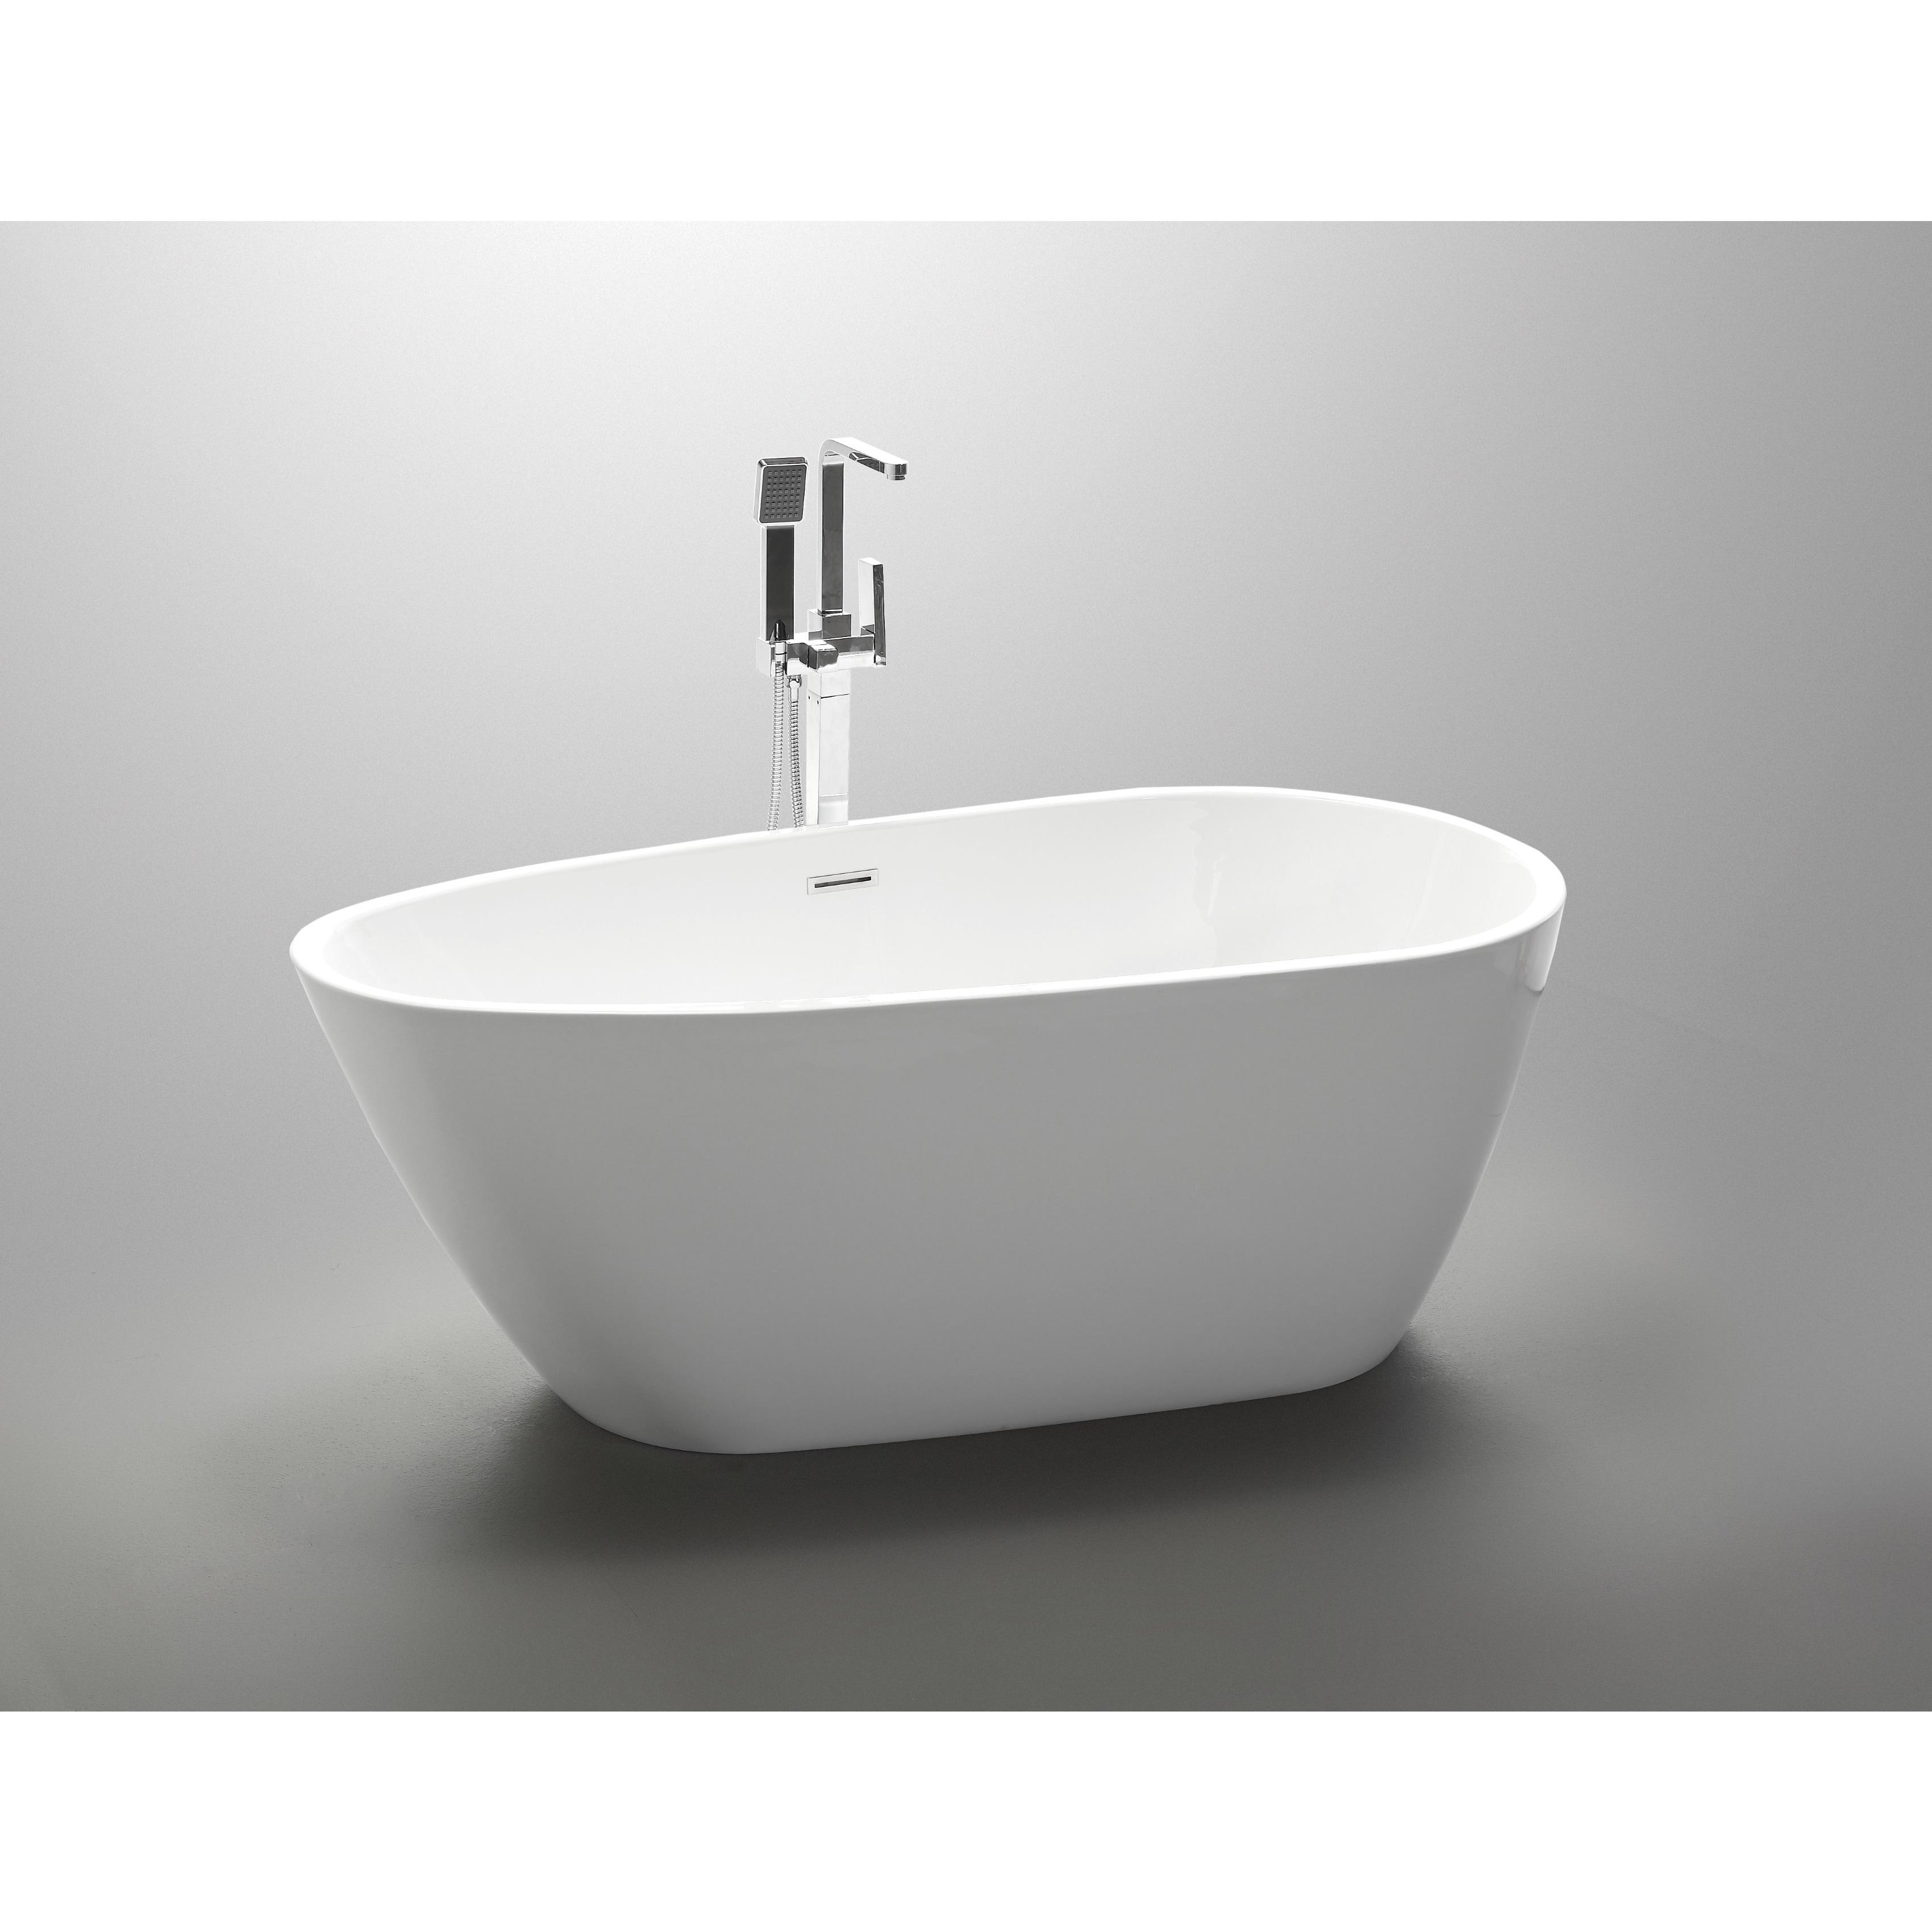 Shop Vanity Art White Acrylic 59-inch Freestanding Soaking Bathtub ...